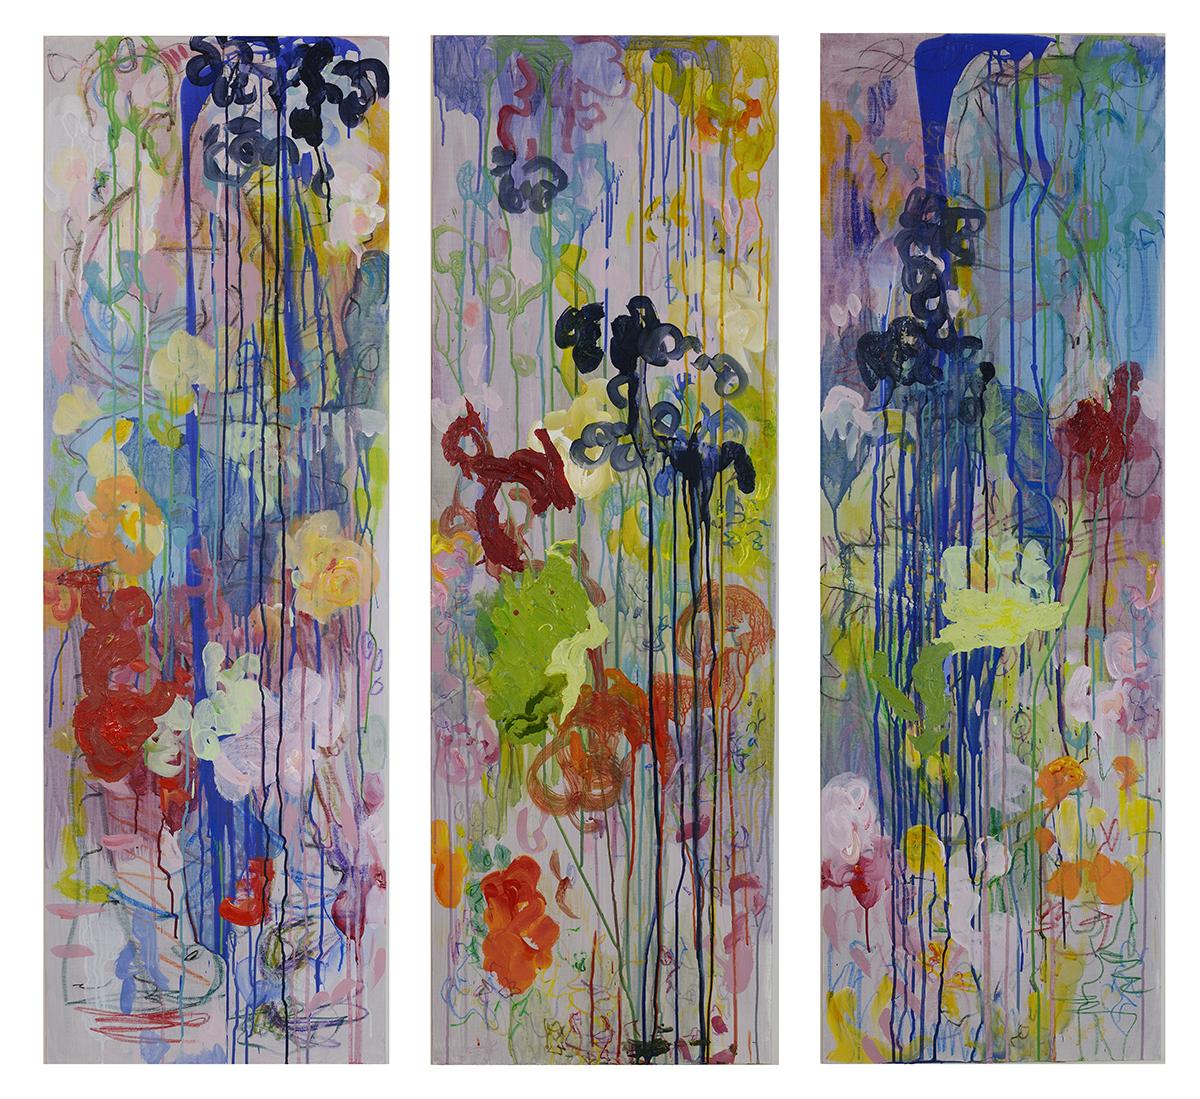 Triptych Spill/Naples